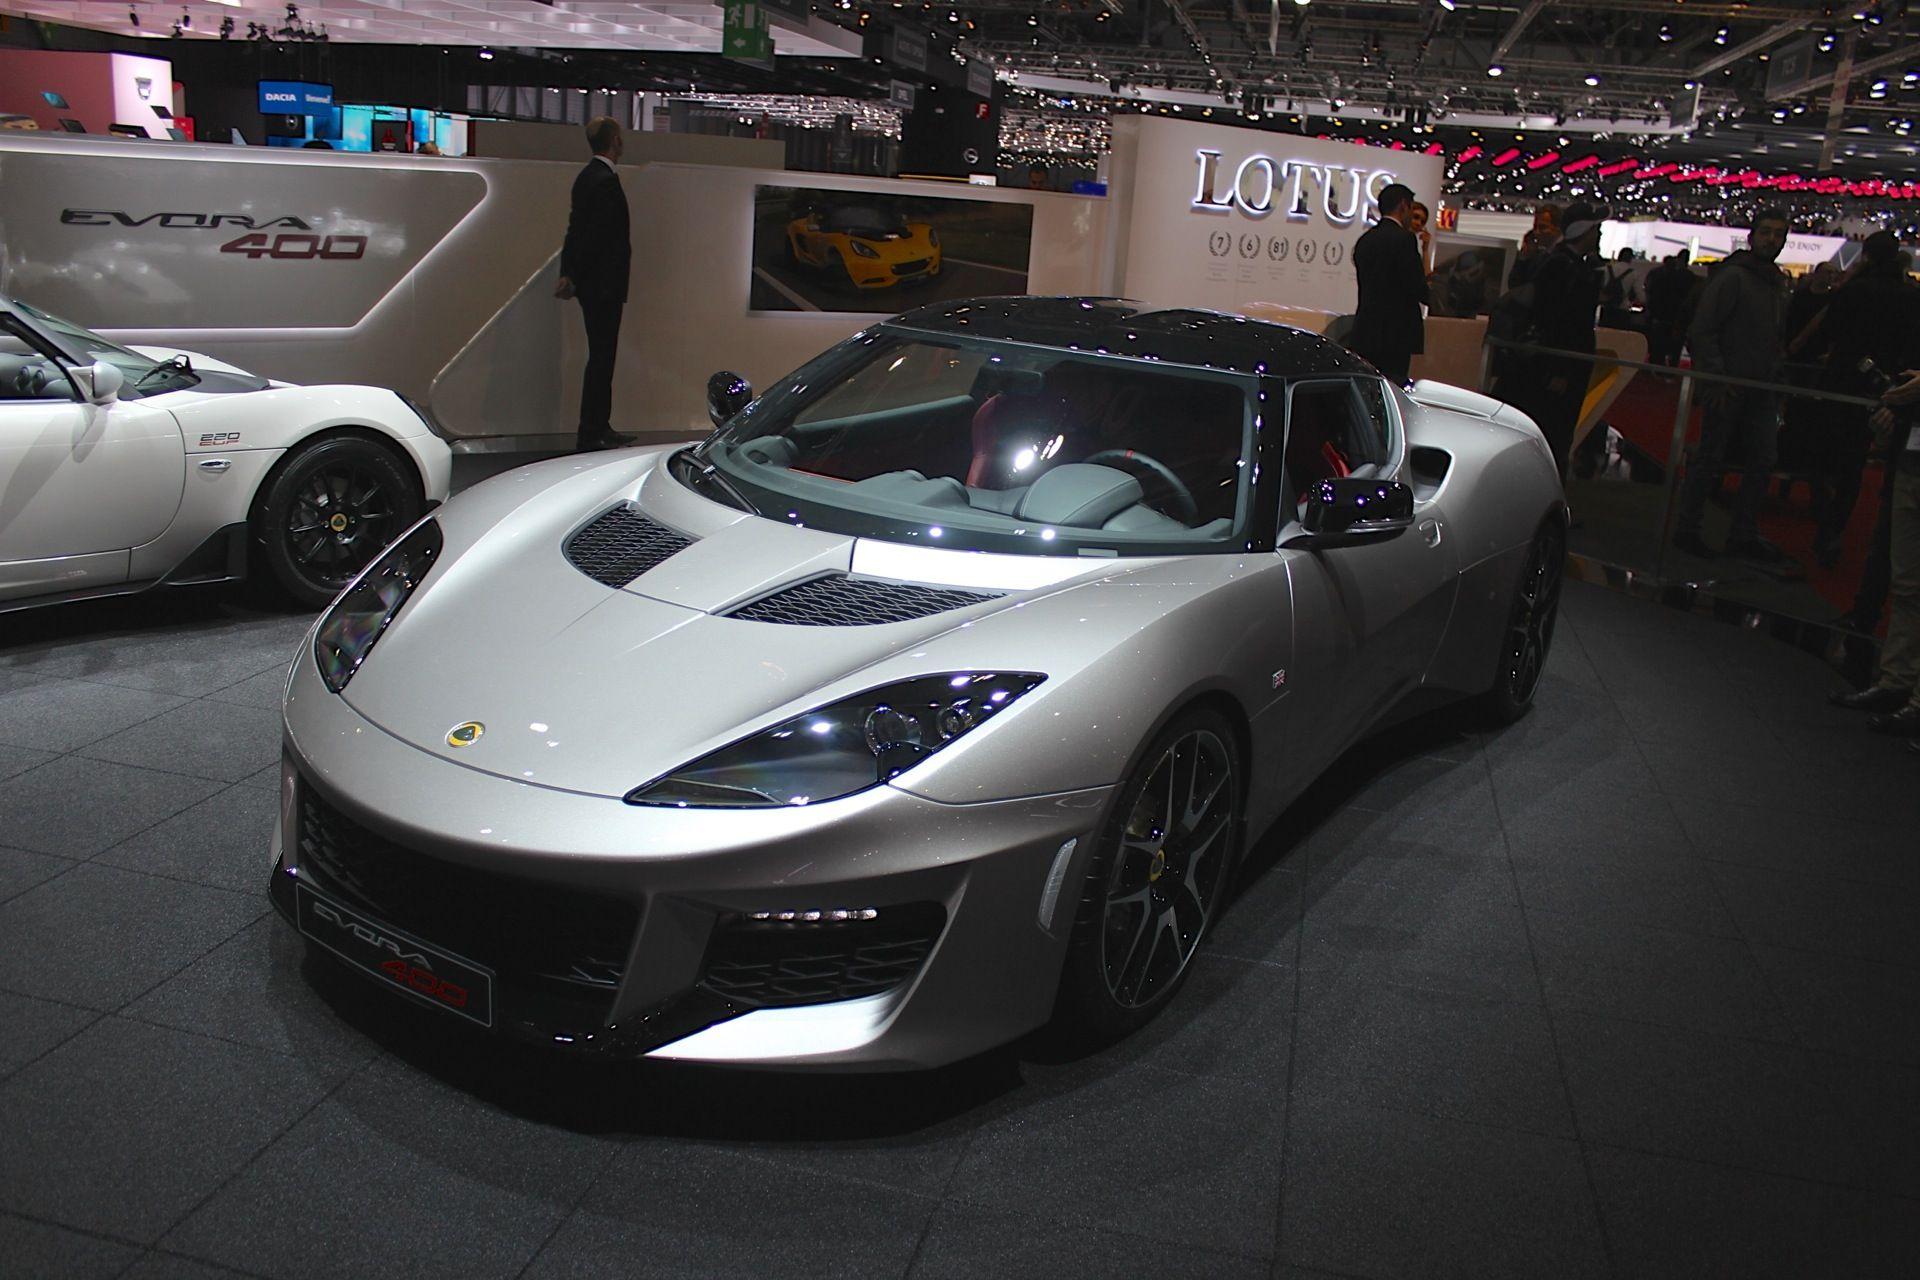 2016 lotus evora 400 is british brands fastest road car